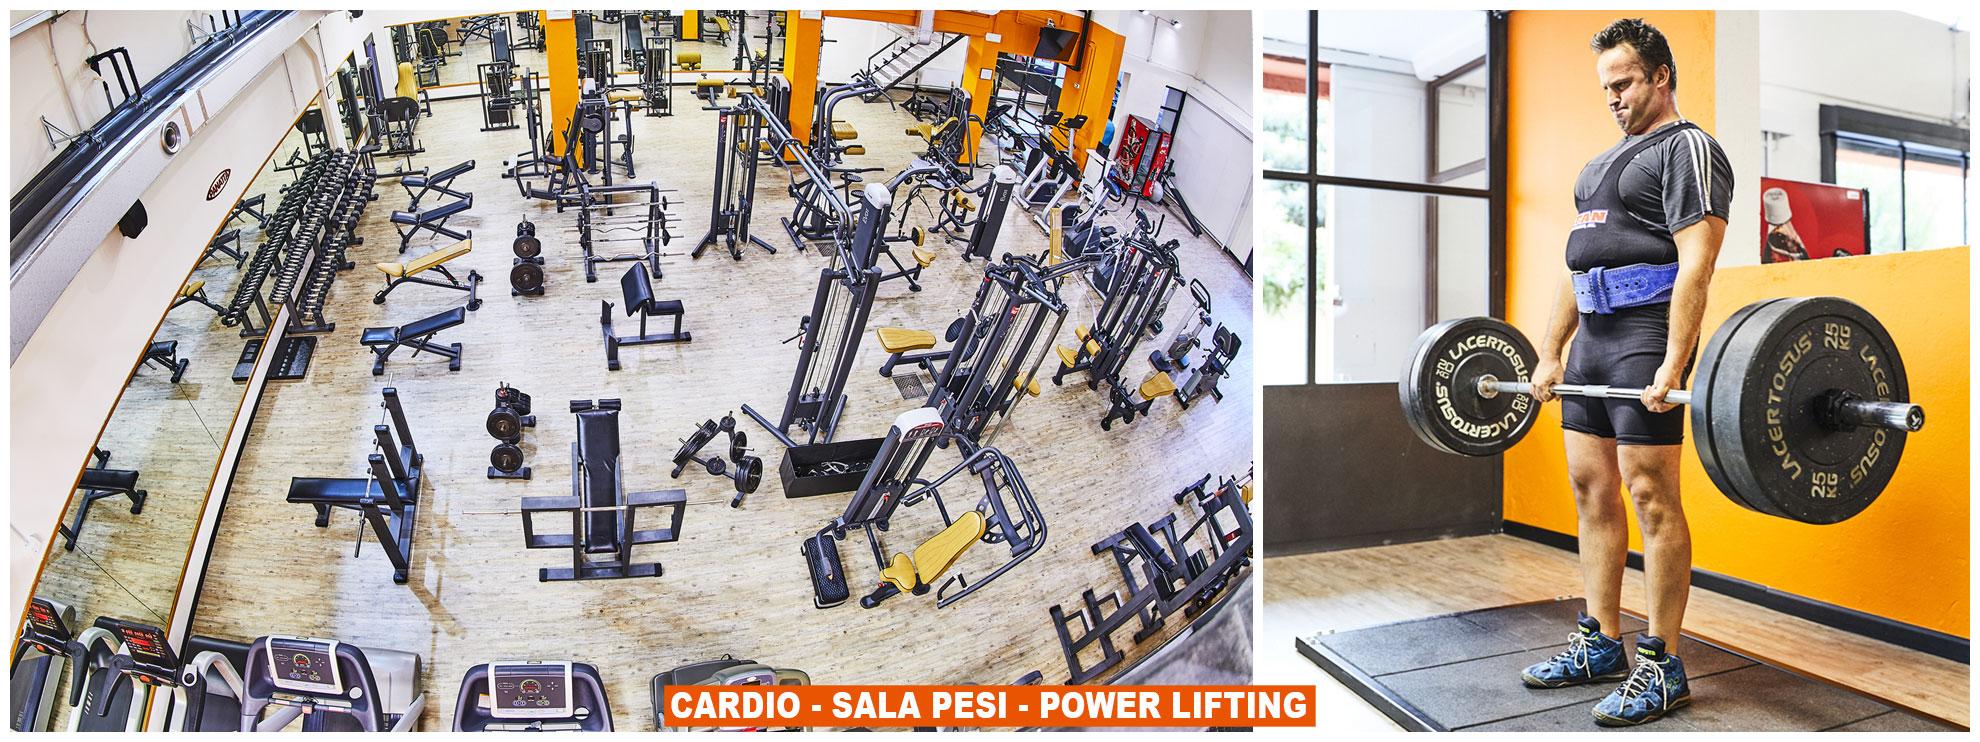 sala pesi - cardio - power lifting